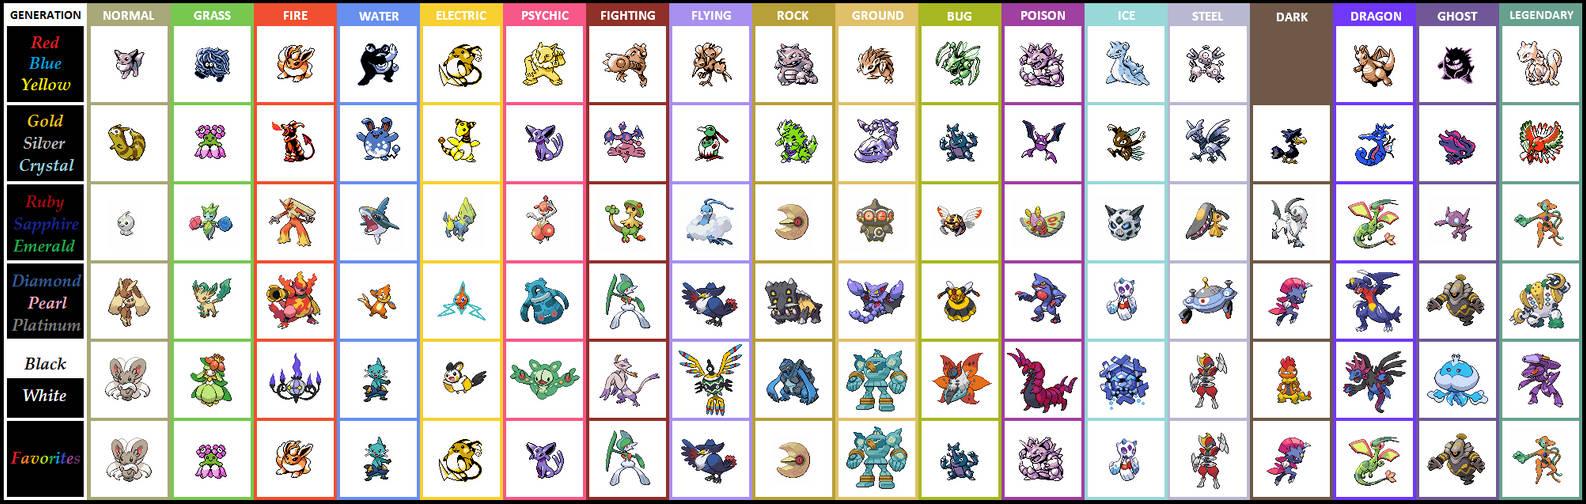 shadowlord90 s favorite pokemon list by shadowlord90 on deviantart